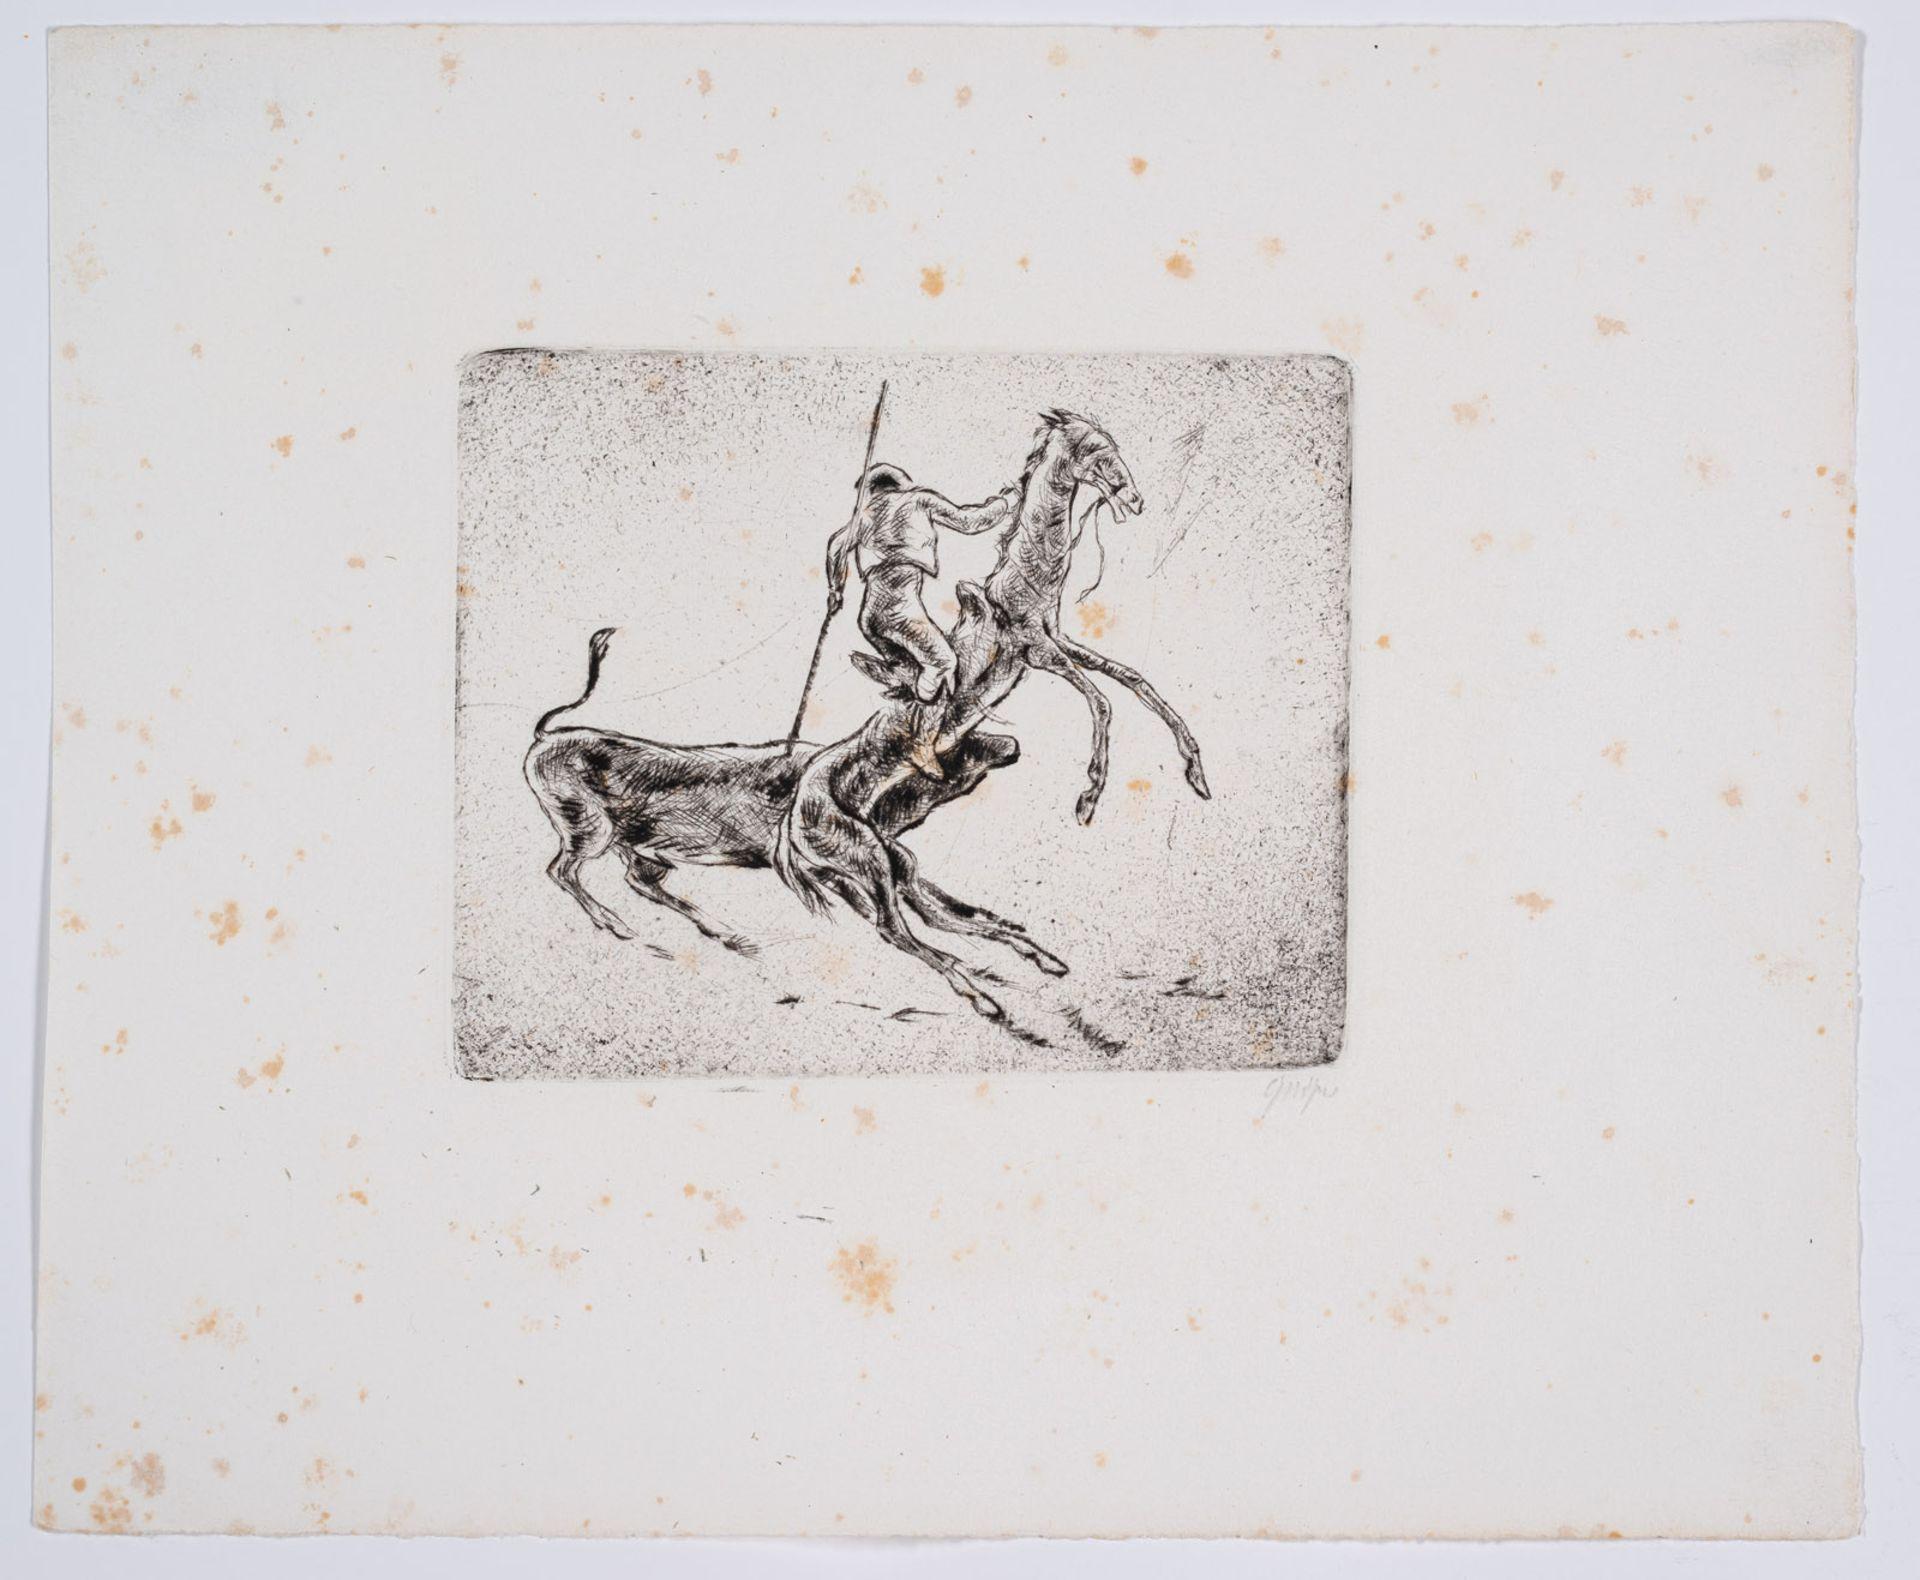 Geiger, Willi - Image 15 of 22